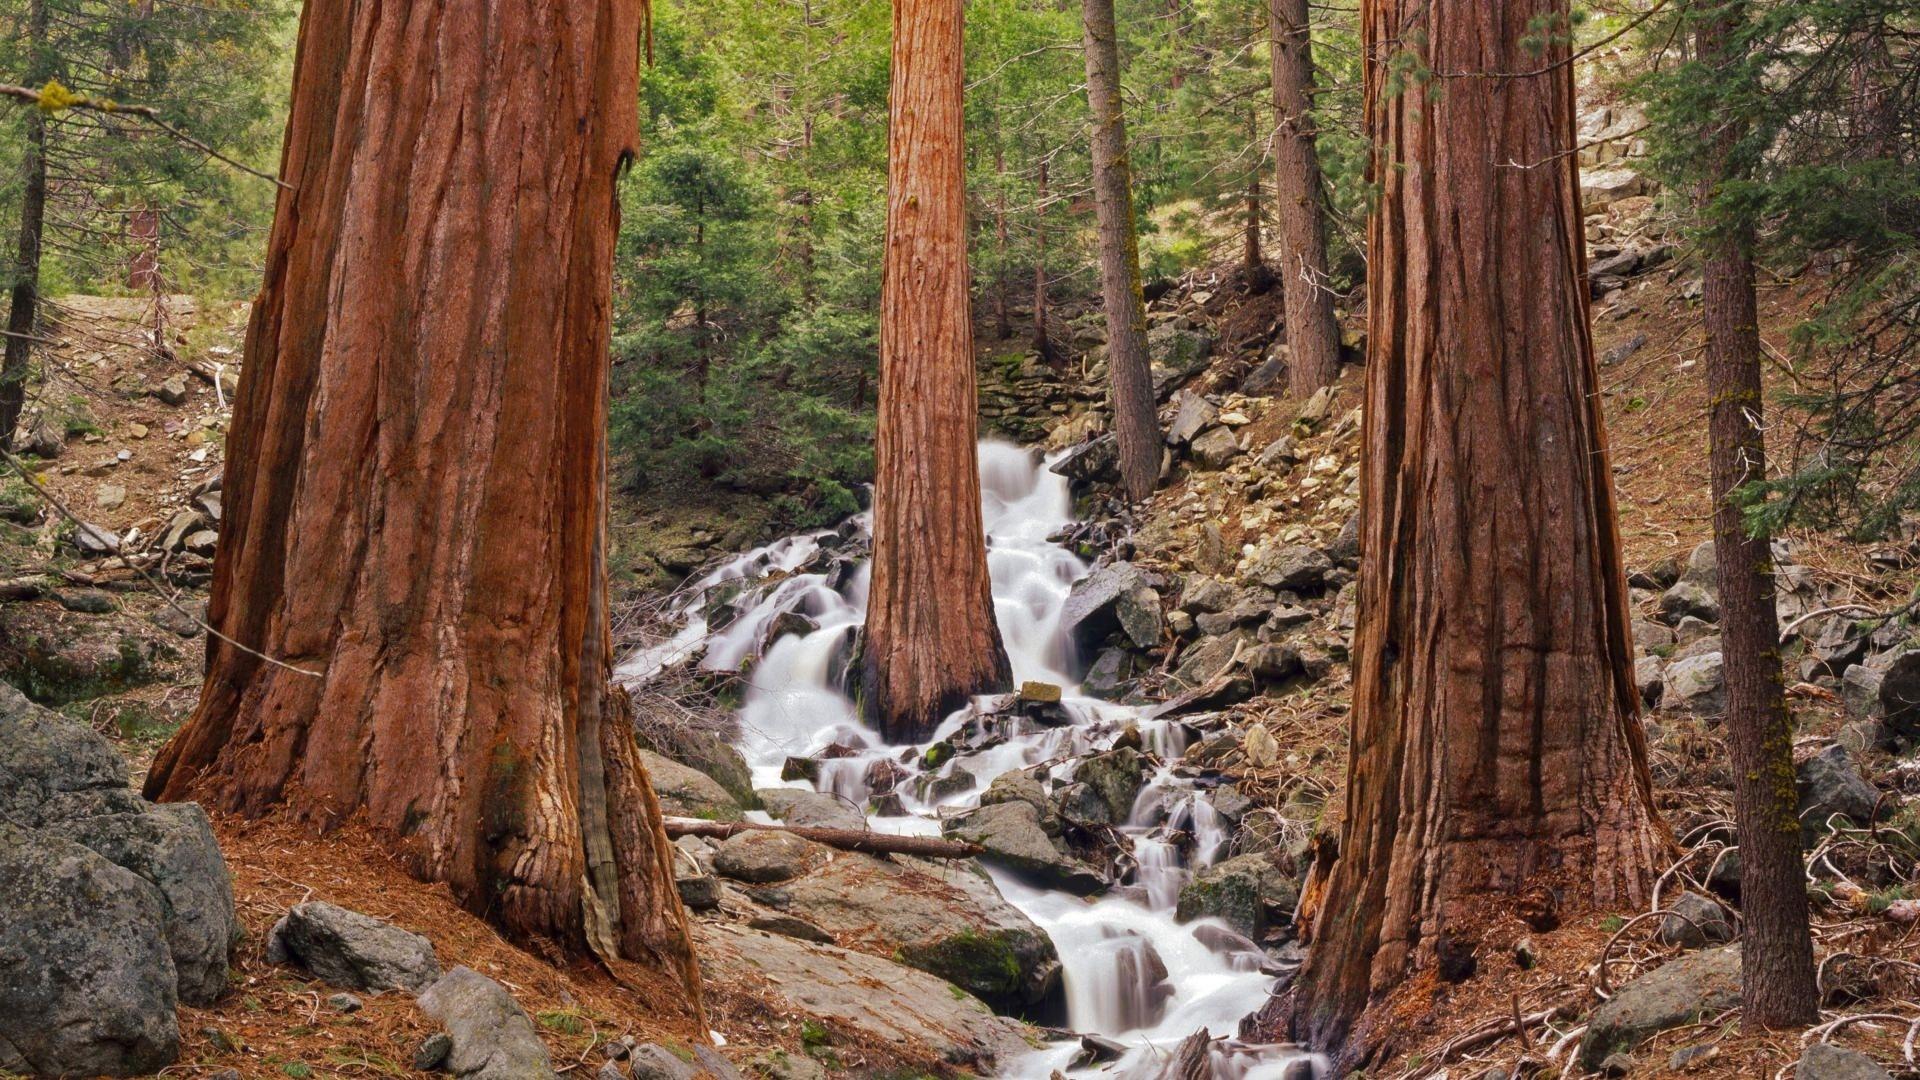 Redwood Trees 1080p wallpaper